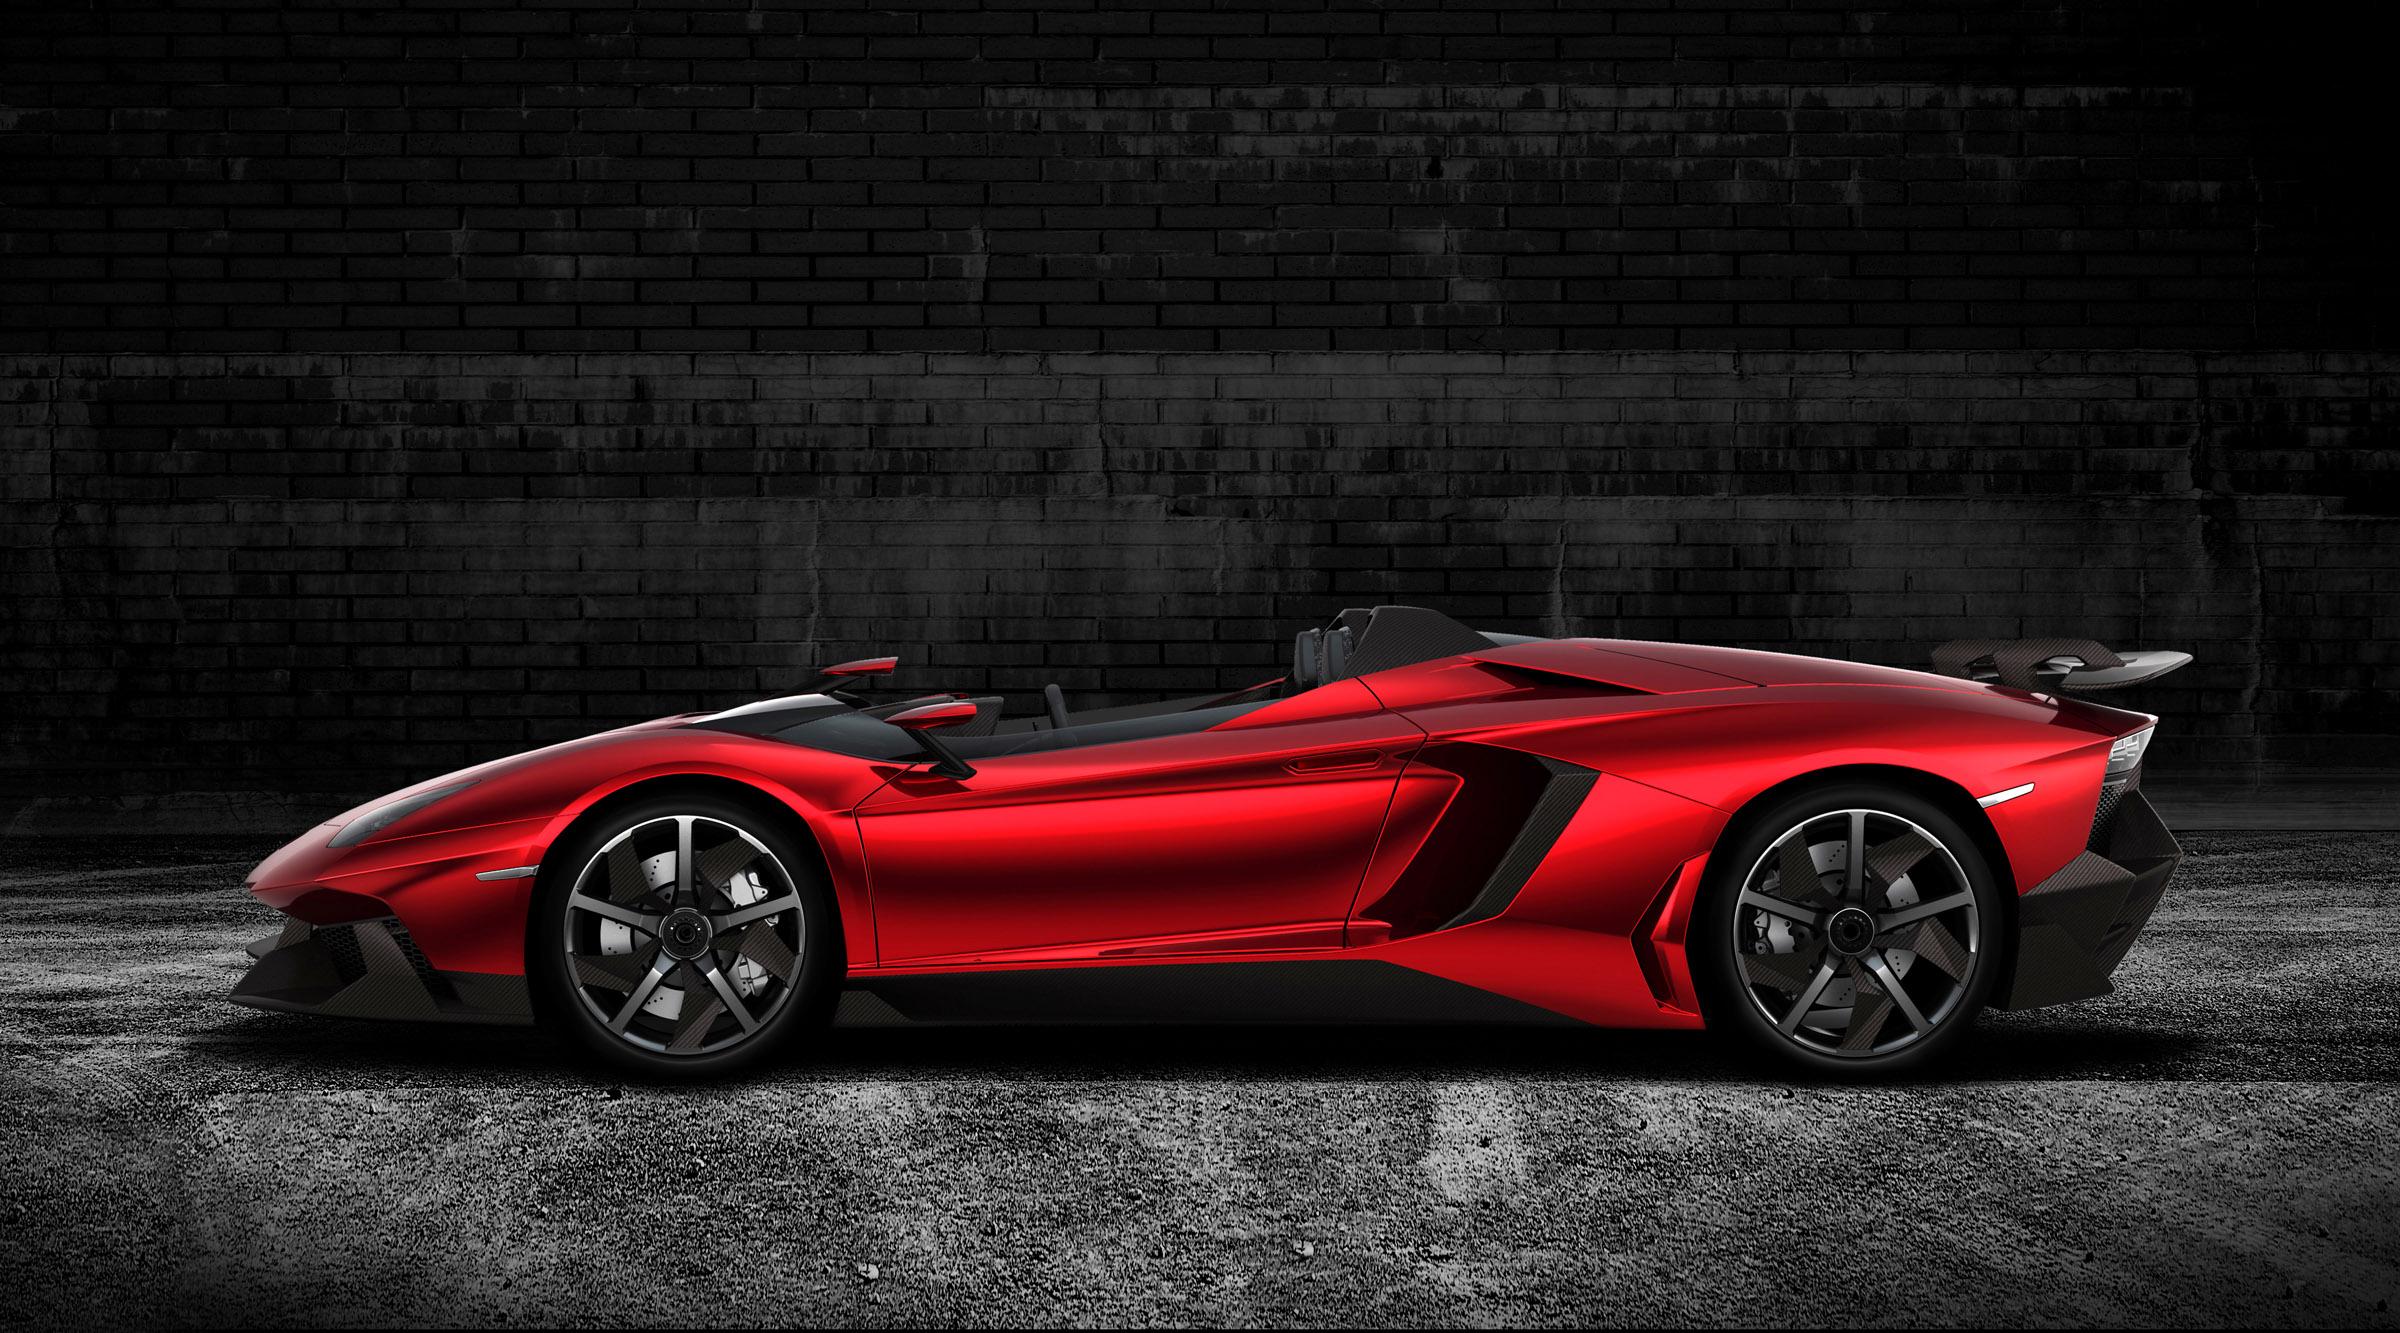 Lamborghini Aventador J Выявлено - фотография №13